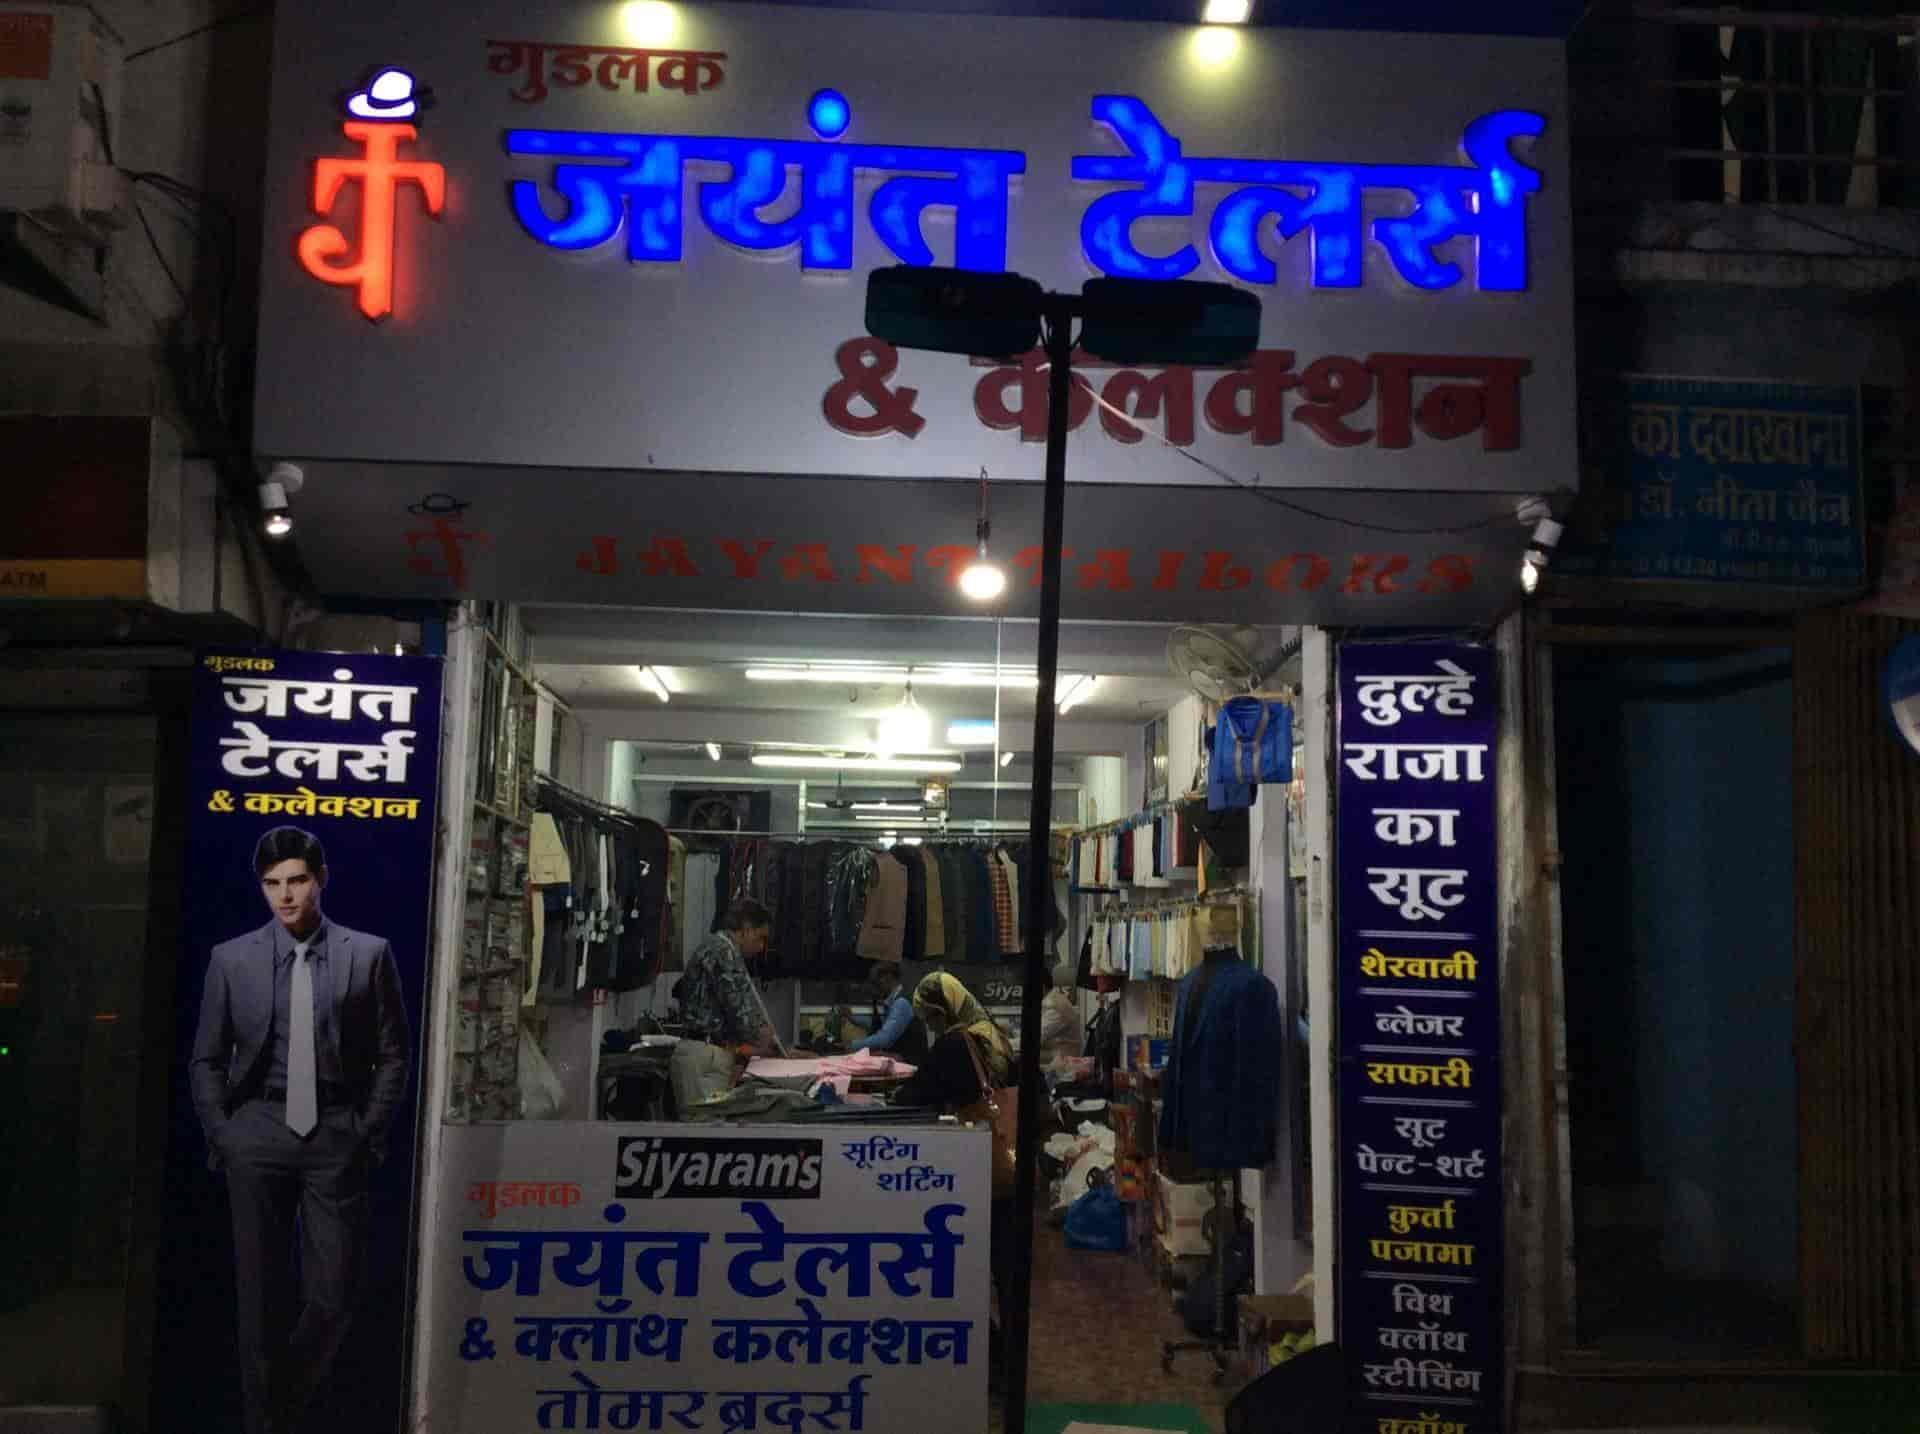 Top 100 Fabric Retailers in Indore GPO, Indore - Best